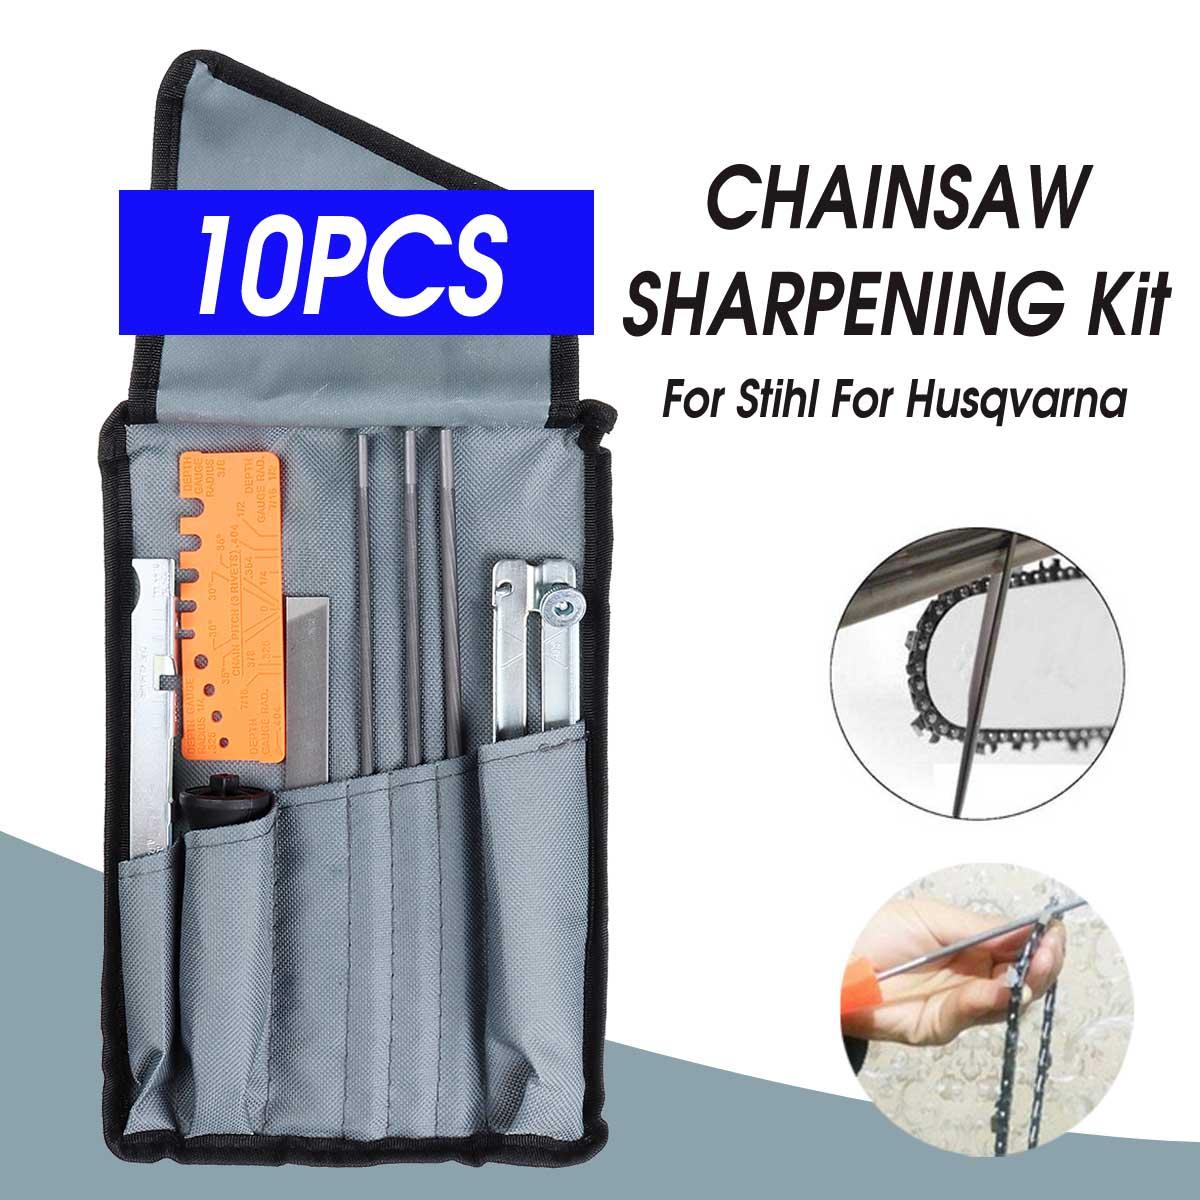 10x Chain Saw Sharpening File Filing Kit Files Tool Chain Sharpener For Husqvarna 33